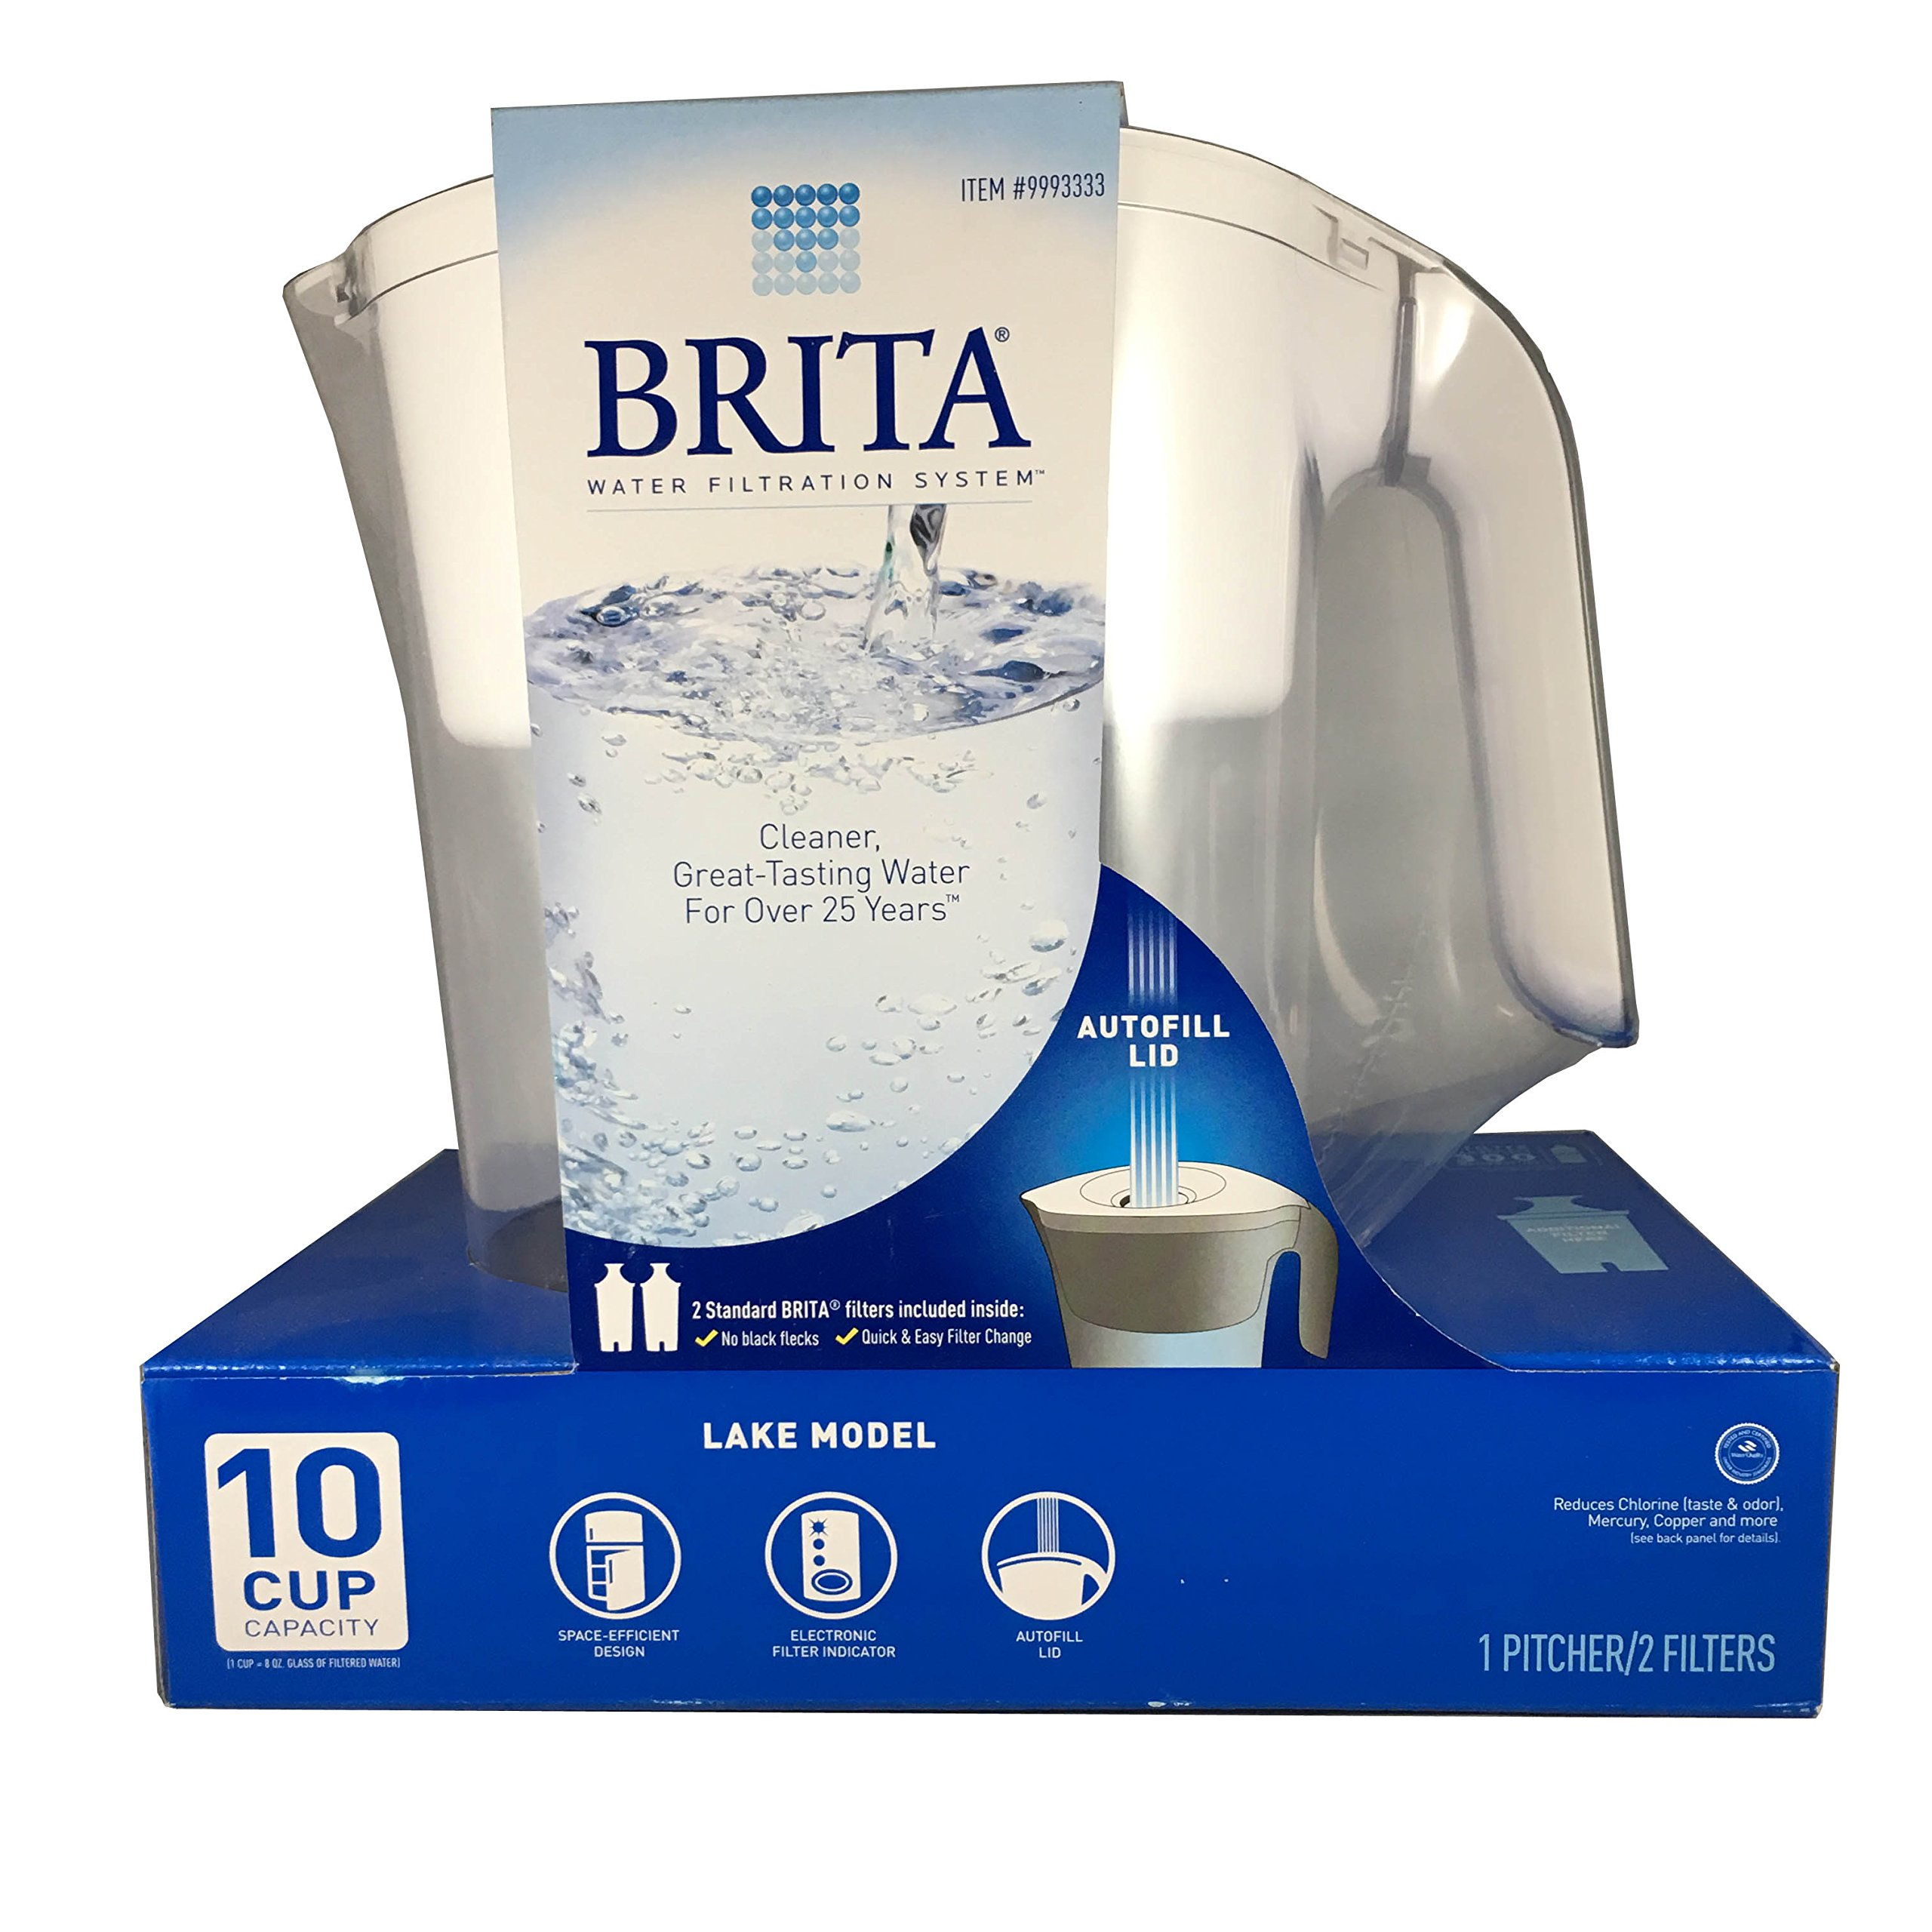 Brita Lake Model White 10 cup